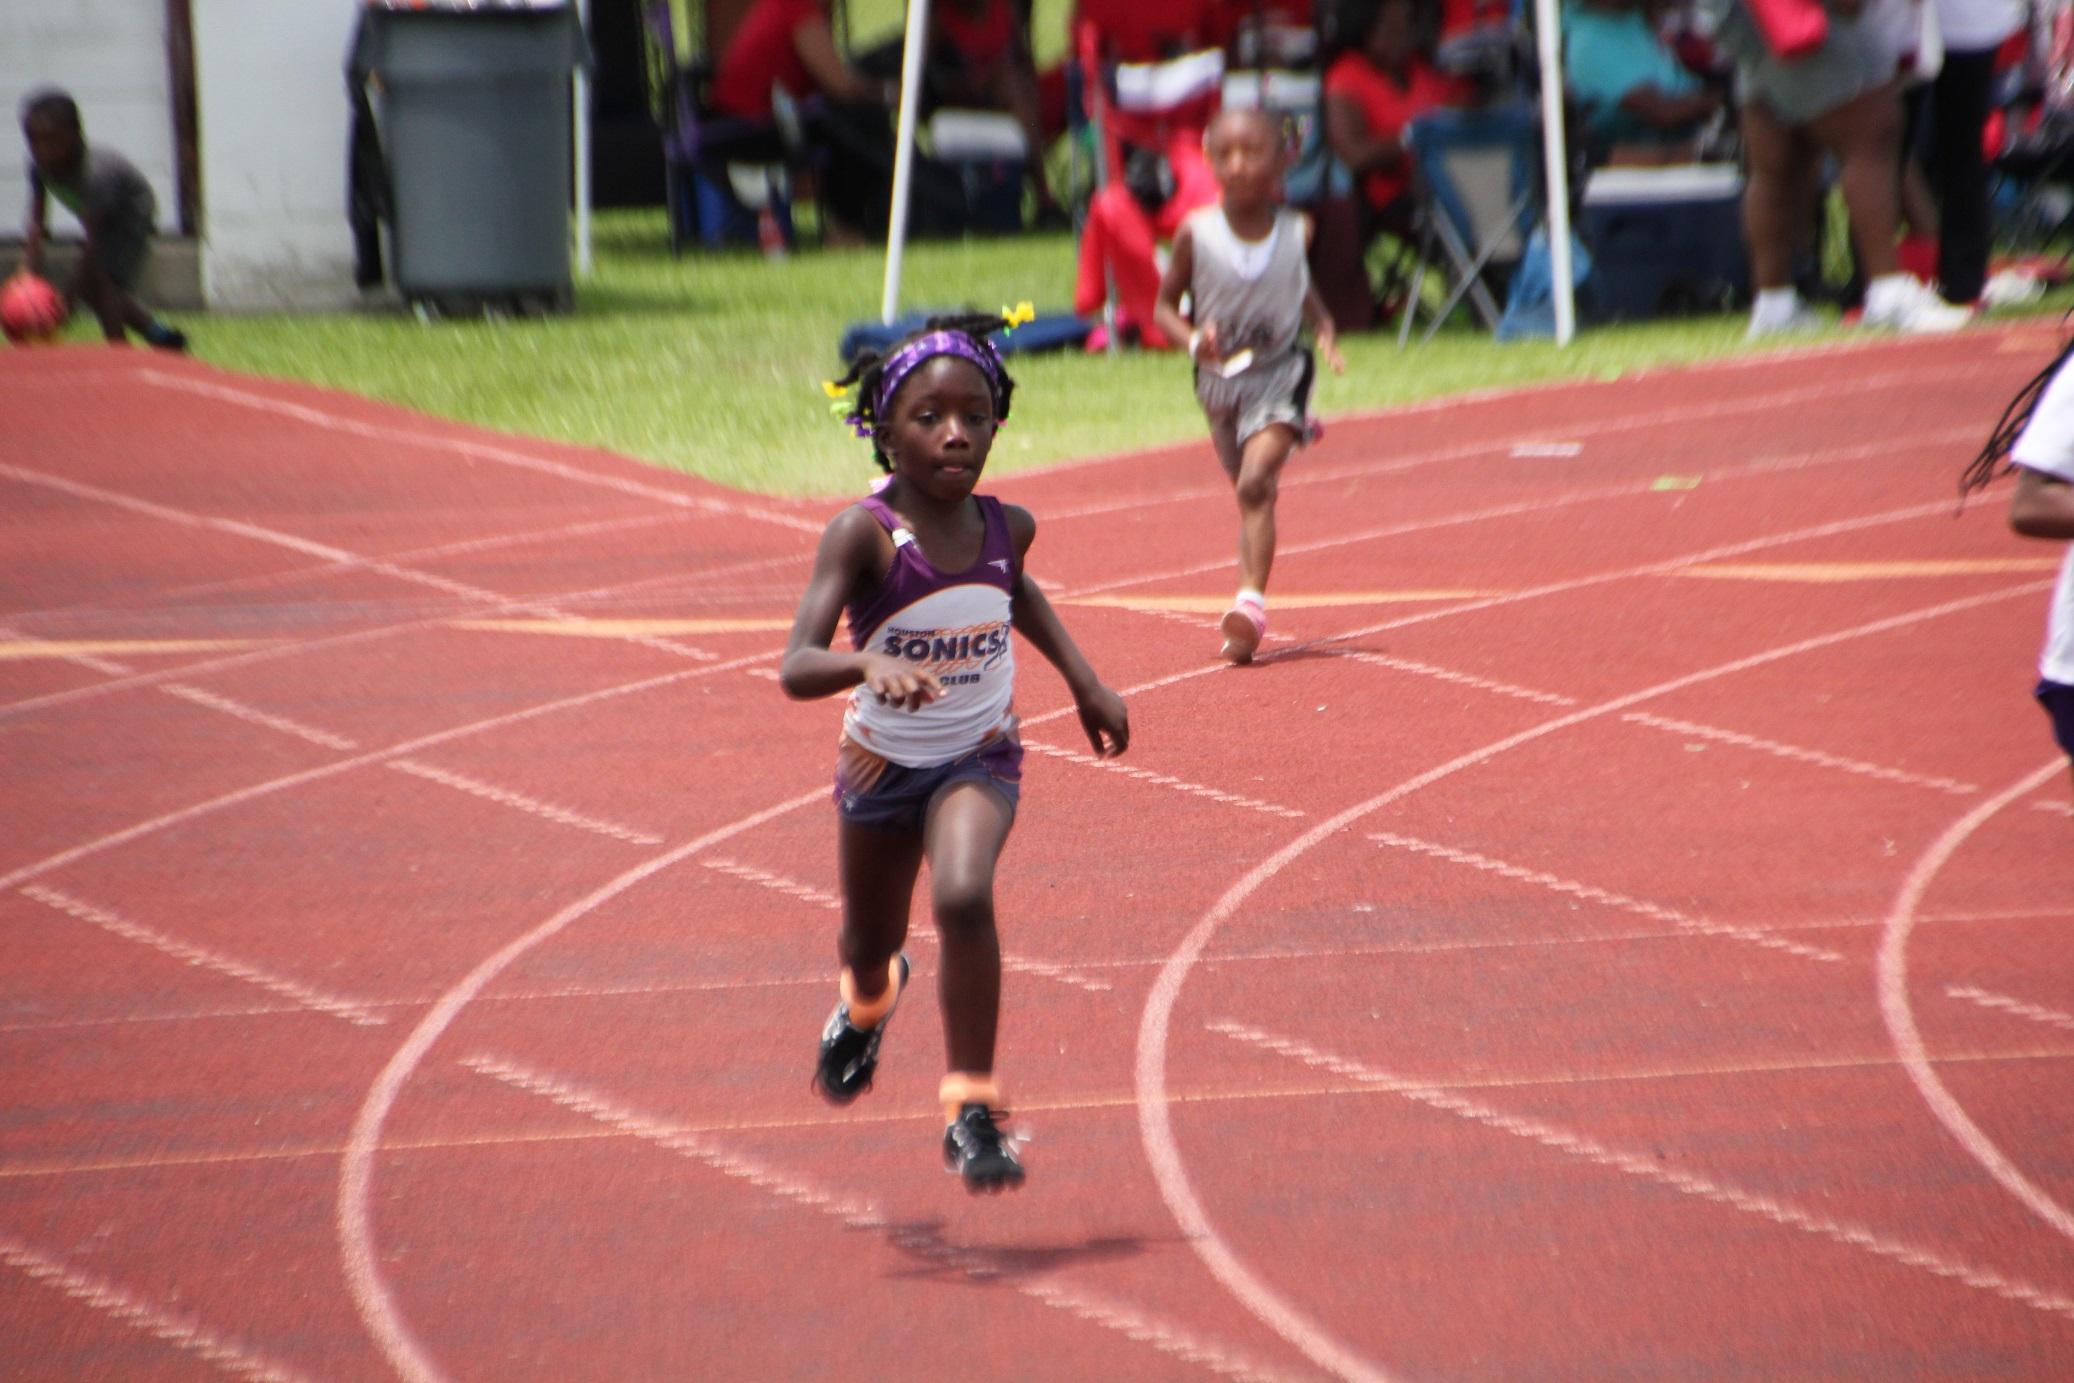 Jim'Myia running the 400m